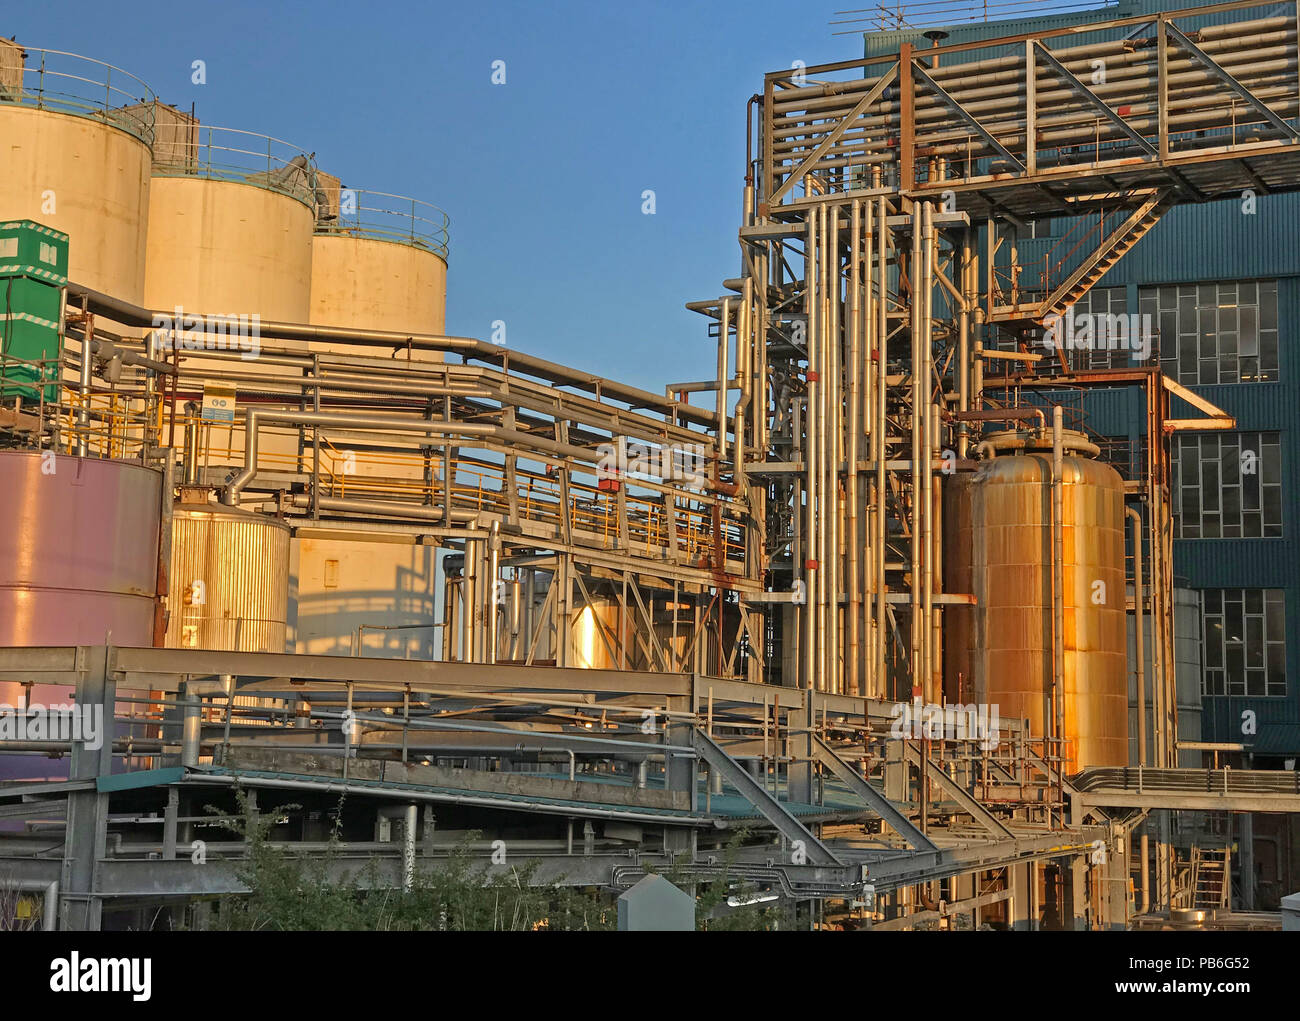 @HotpixUK,GoTonySmith,soap,Chemical,Lever,Brothers,Ltd,Warrington Bank Quay,Cheshire,North West England,UK,limited,tank,tanks,storage